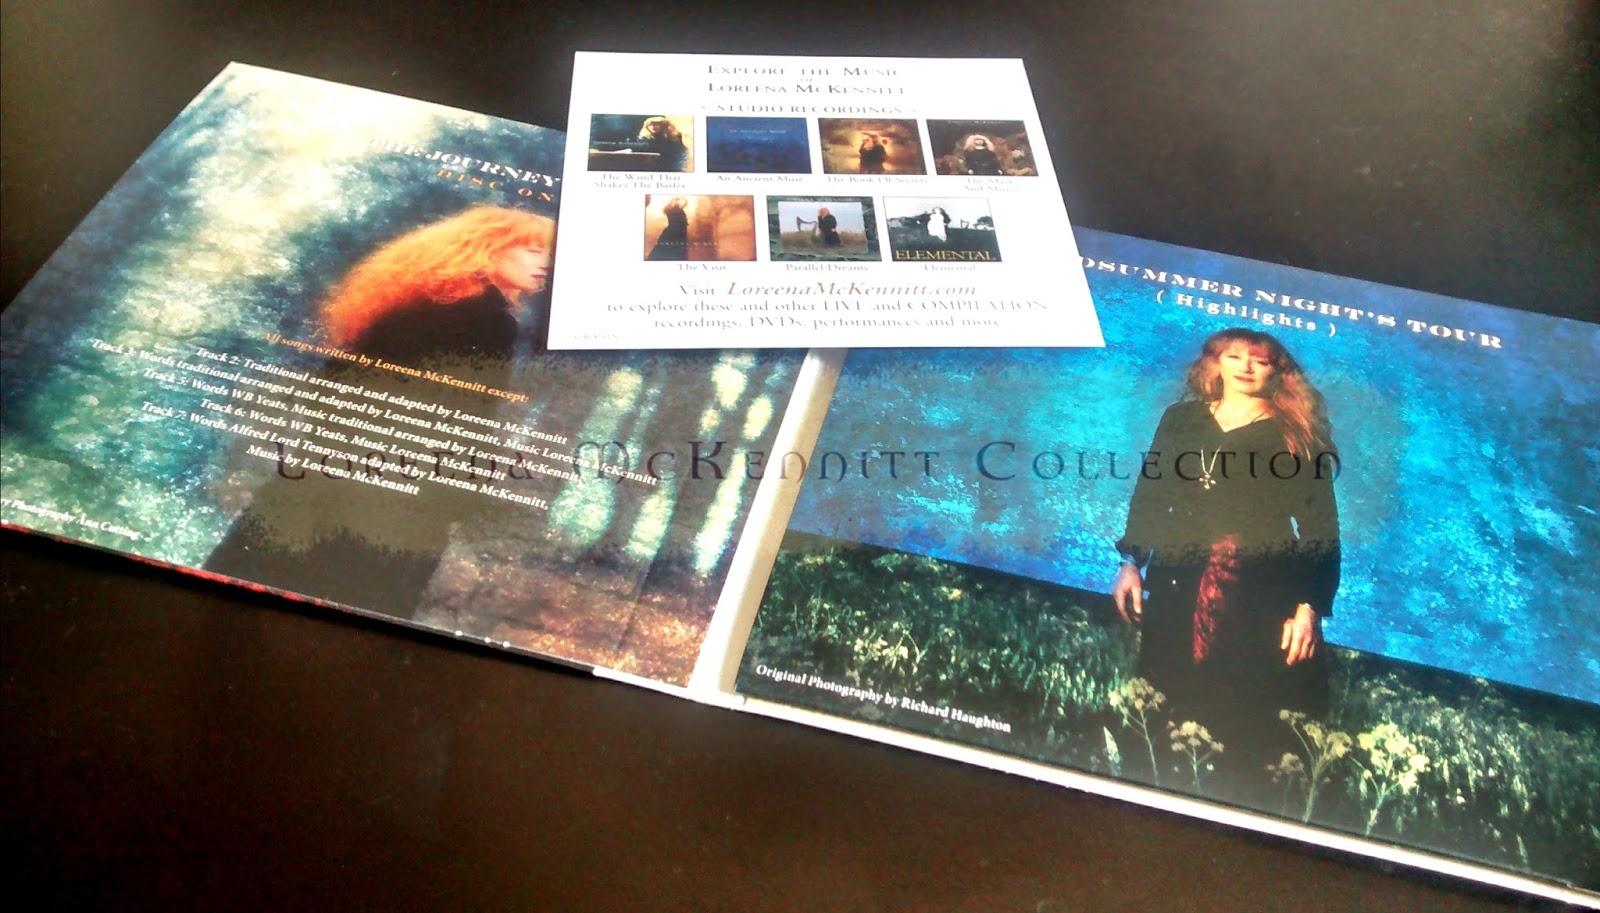 loreena mckennitt collection 2014 the journey so far 2cd